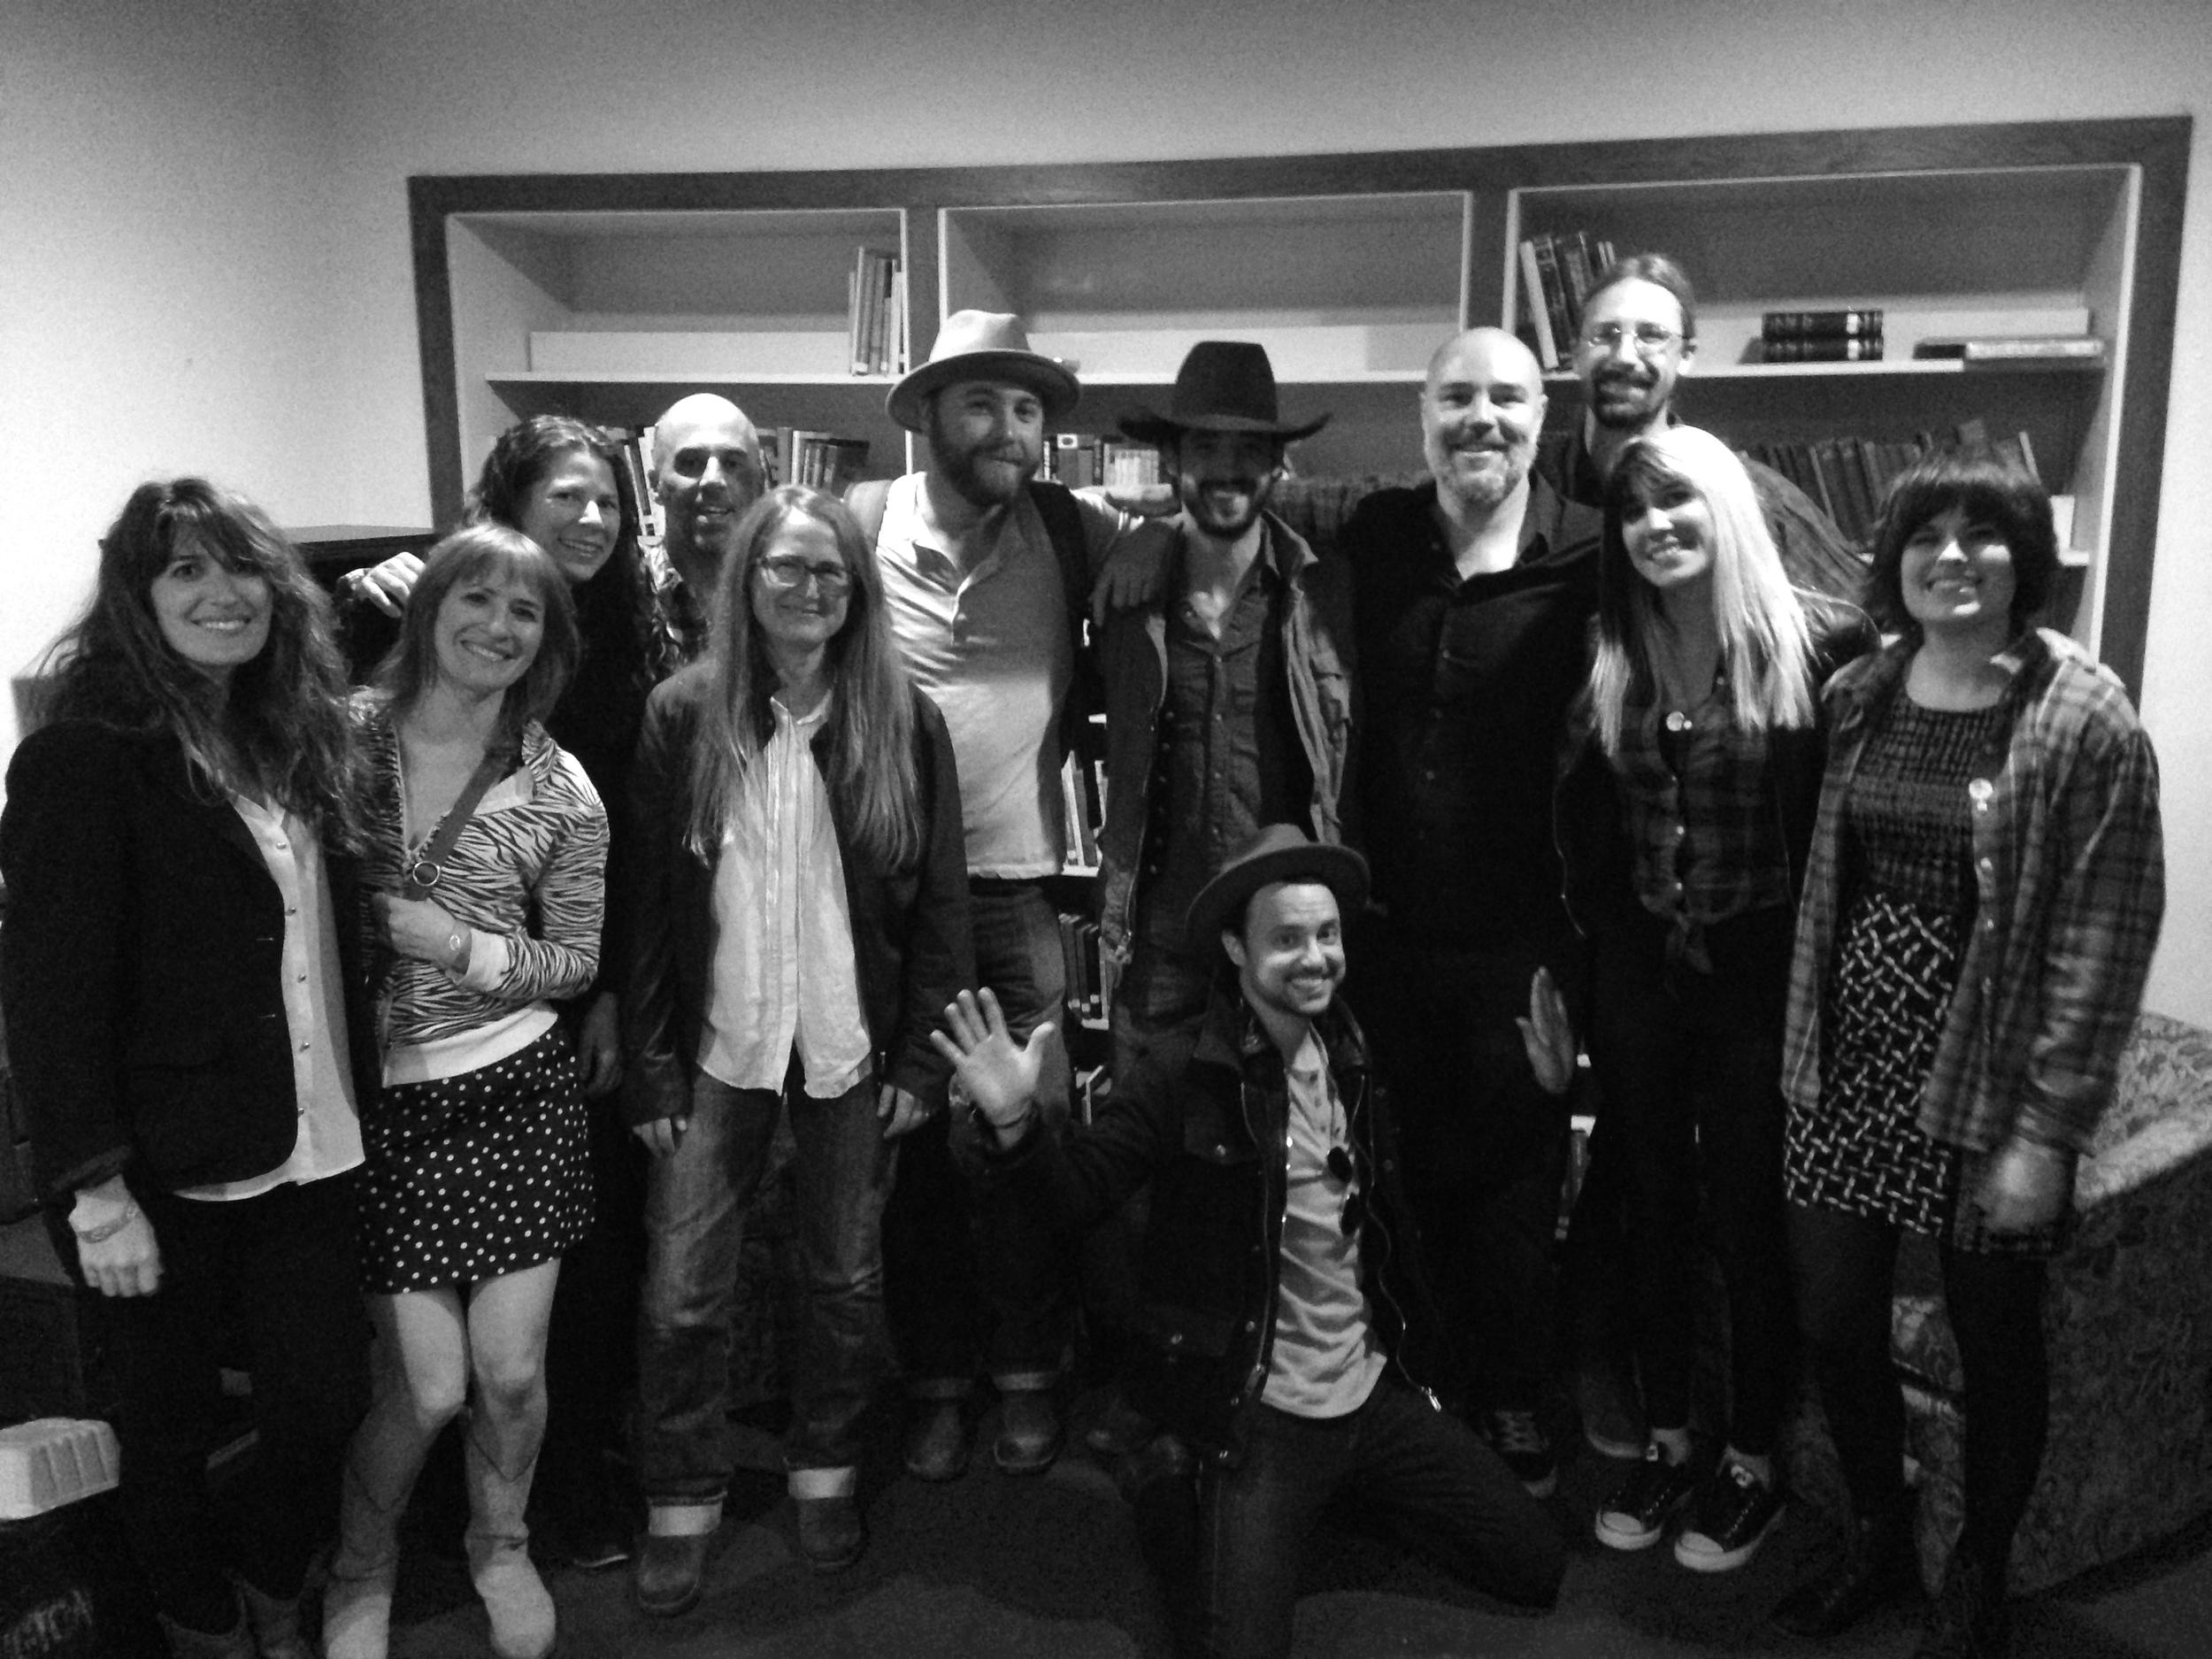 Ryan Bingham & The Crew